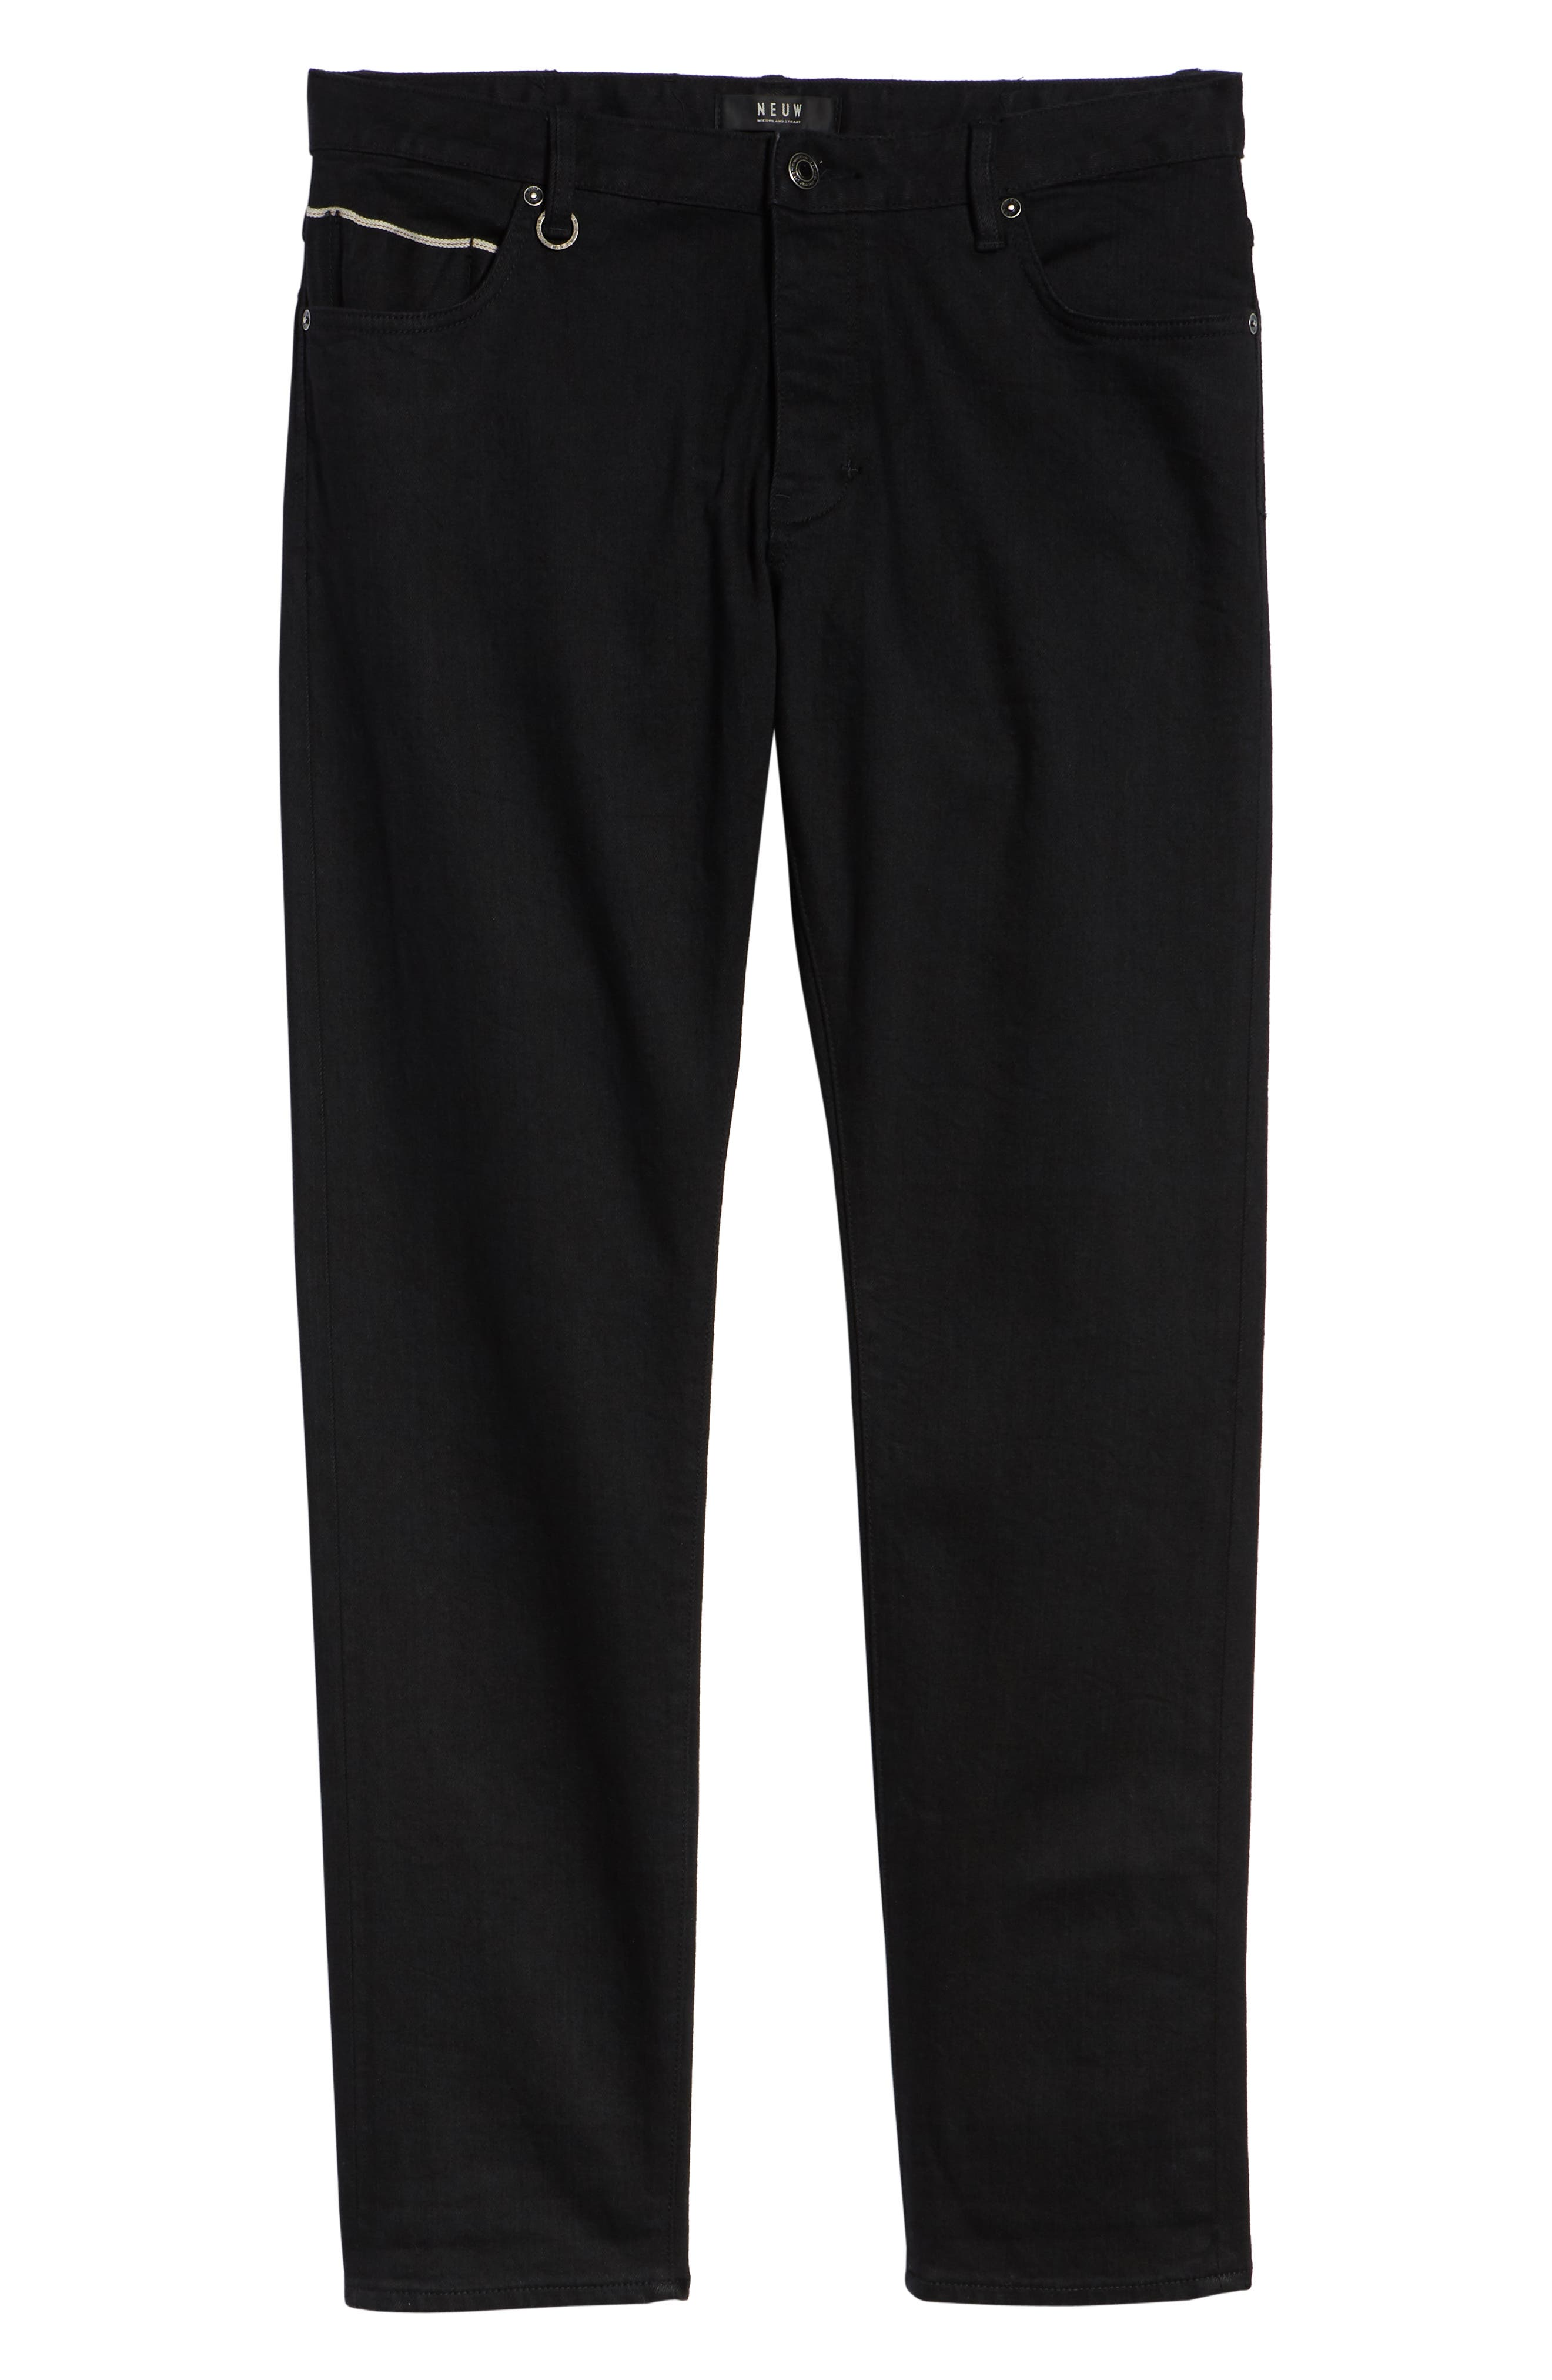 Lou Slim Fit Jeans,                             Alternate thumbnail 6, color,                             BLACK SELVEDGE